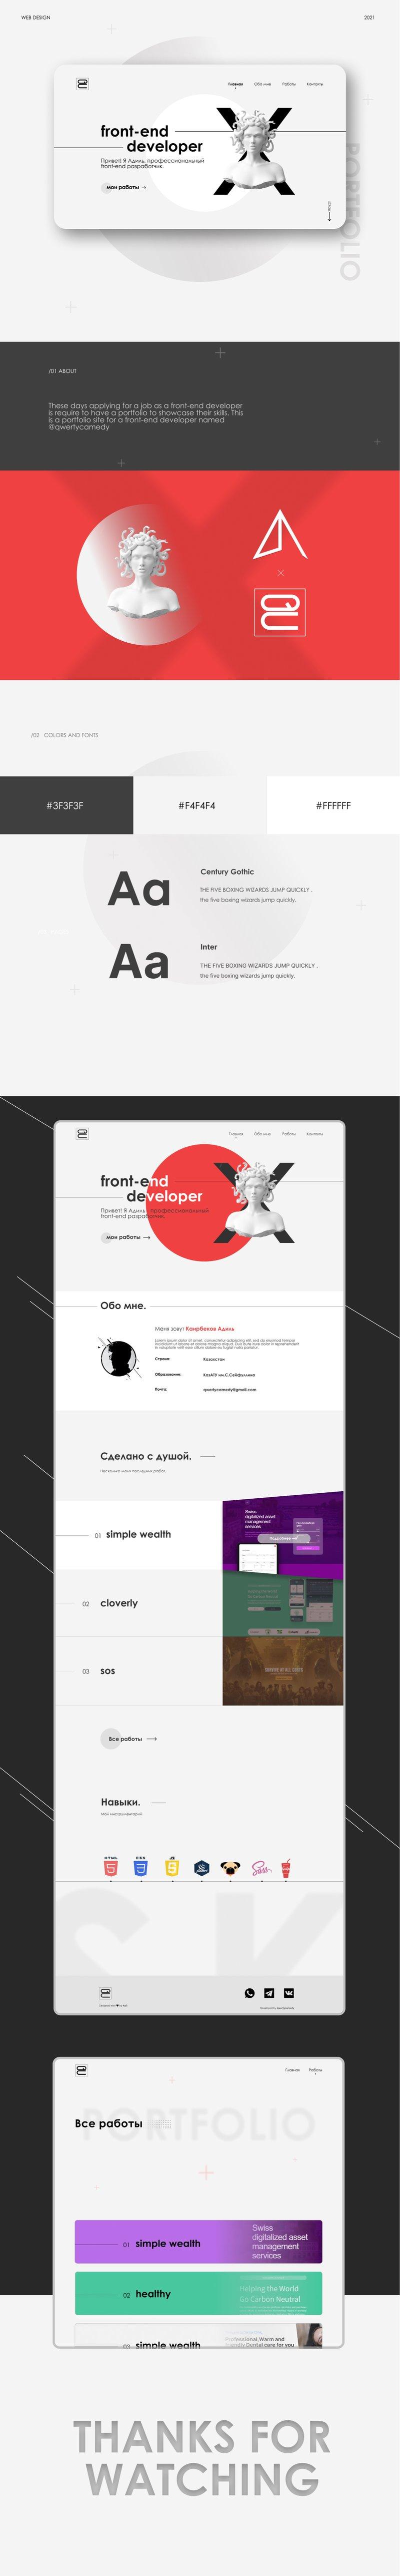 Сайт-портфолио для веб-разработчика – работа в портфолио фрилансера